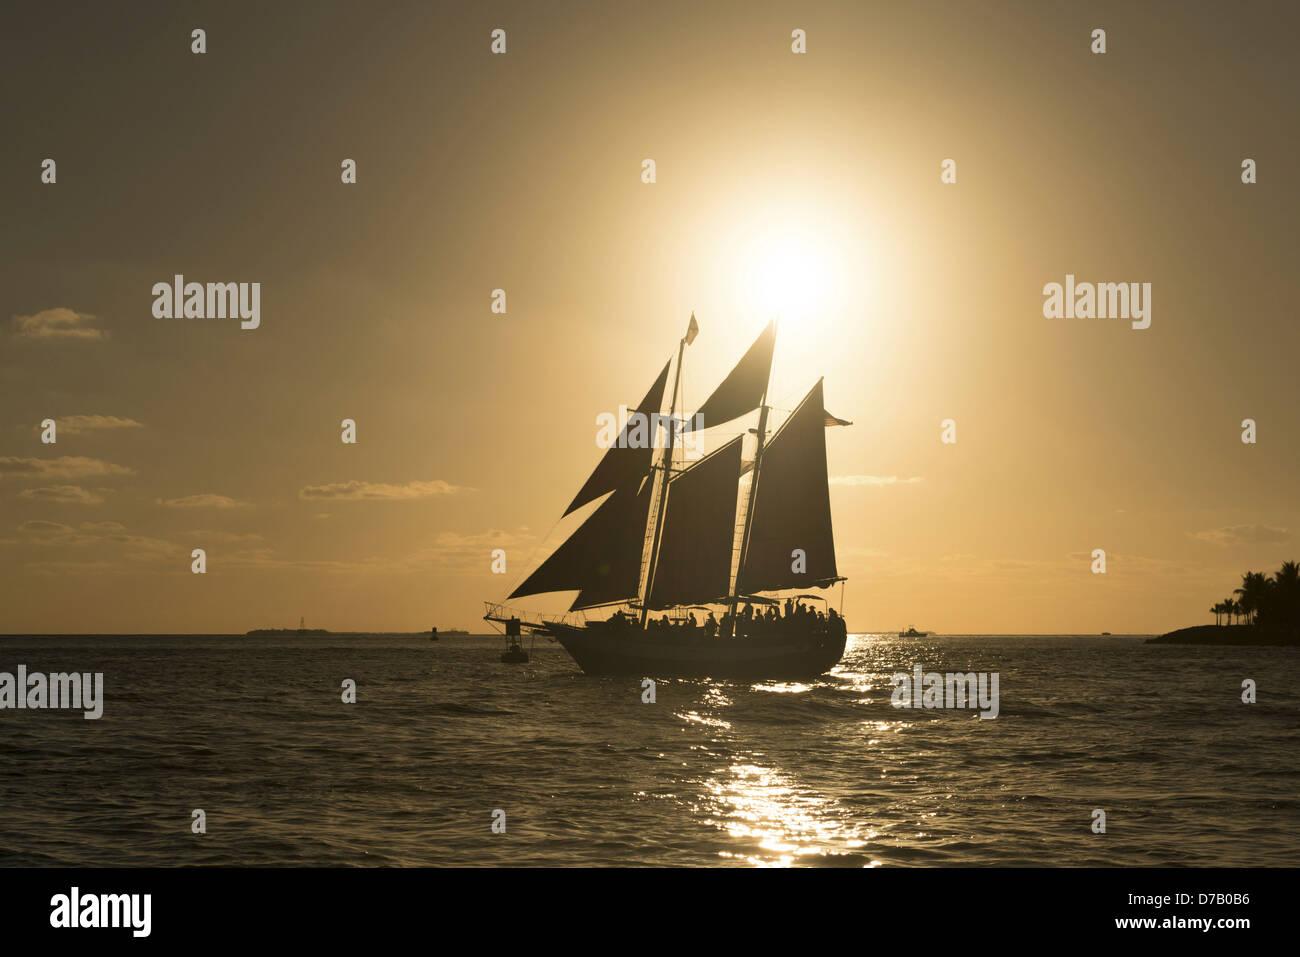 Saling ship in front of sunset, Key West, Florida Keys, Florida, USA - Stock Image